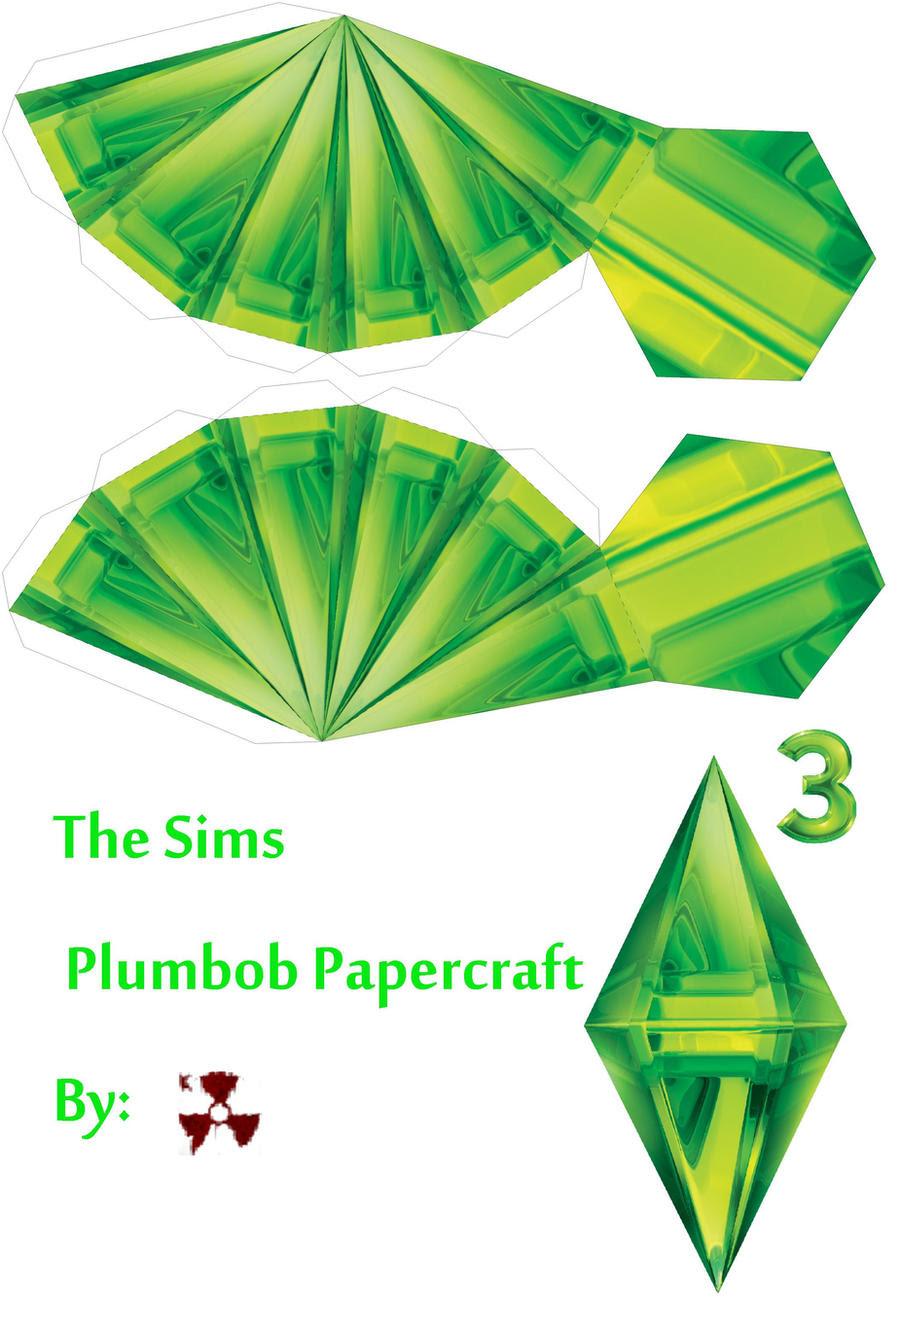 sims plumbob template.html